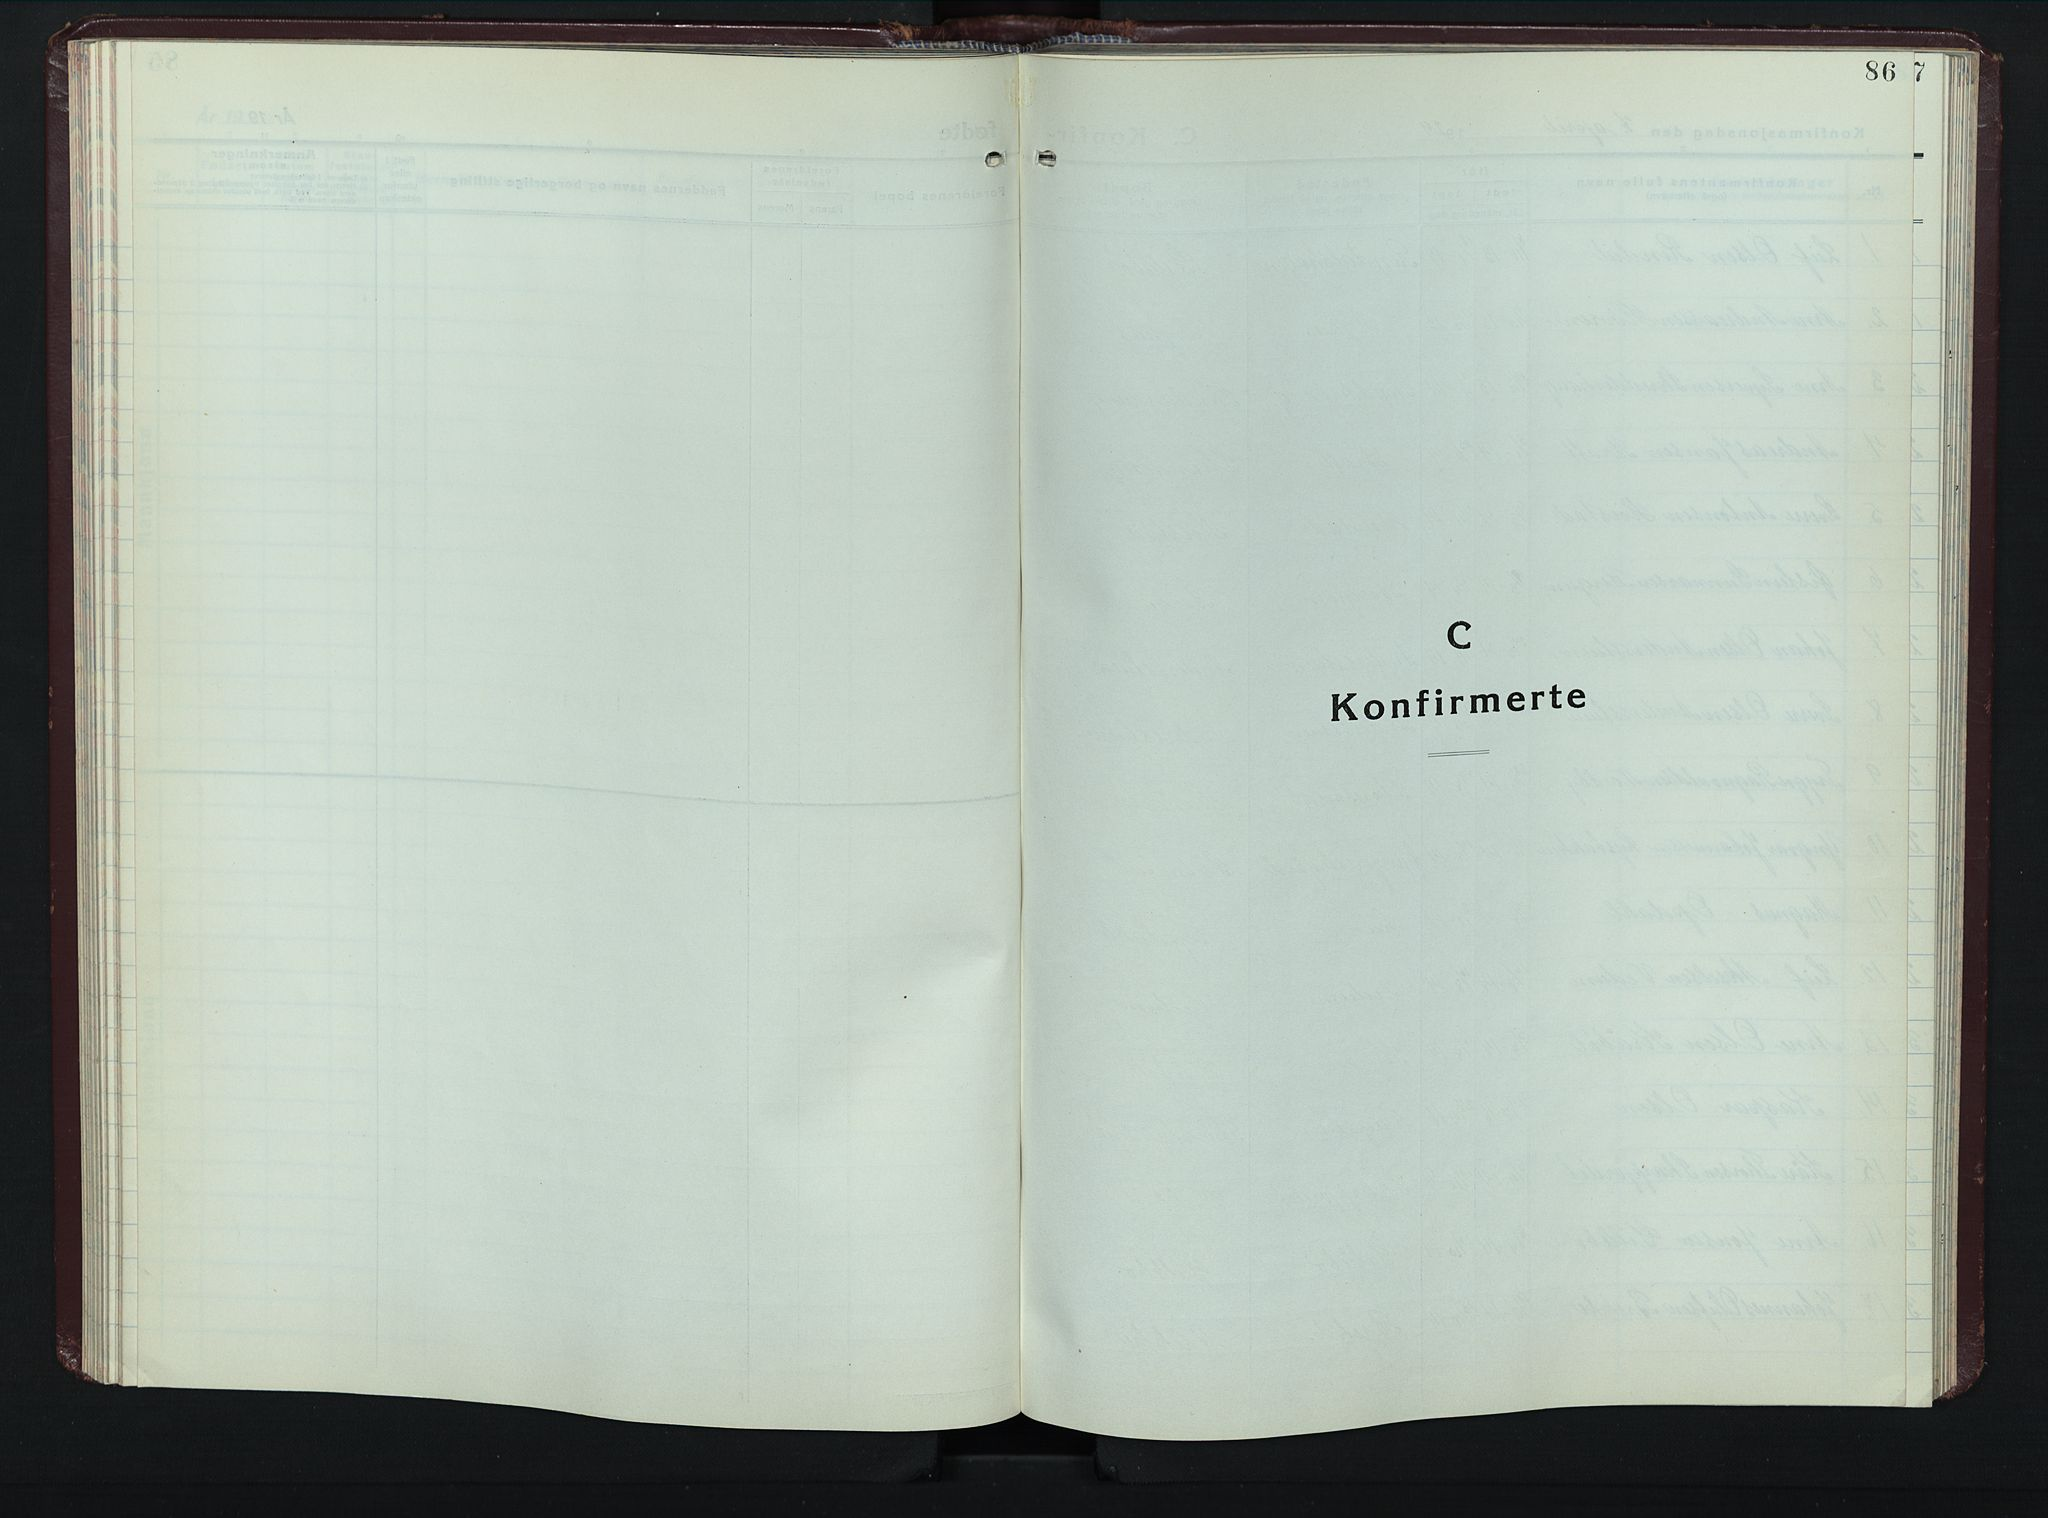 SAH, Øyer prestekontor, Klokkerbok nr. 8, 1929-1947, s. 86